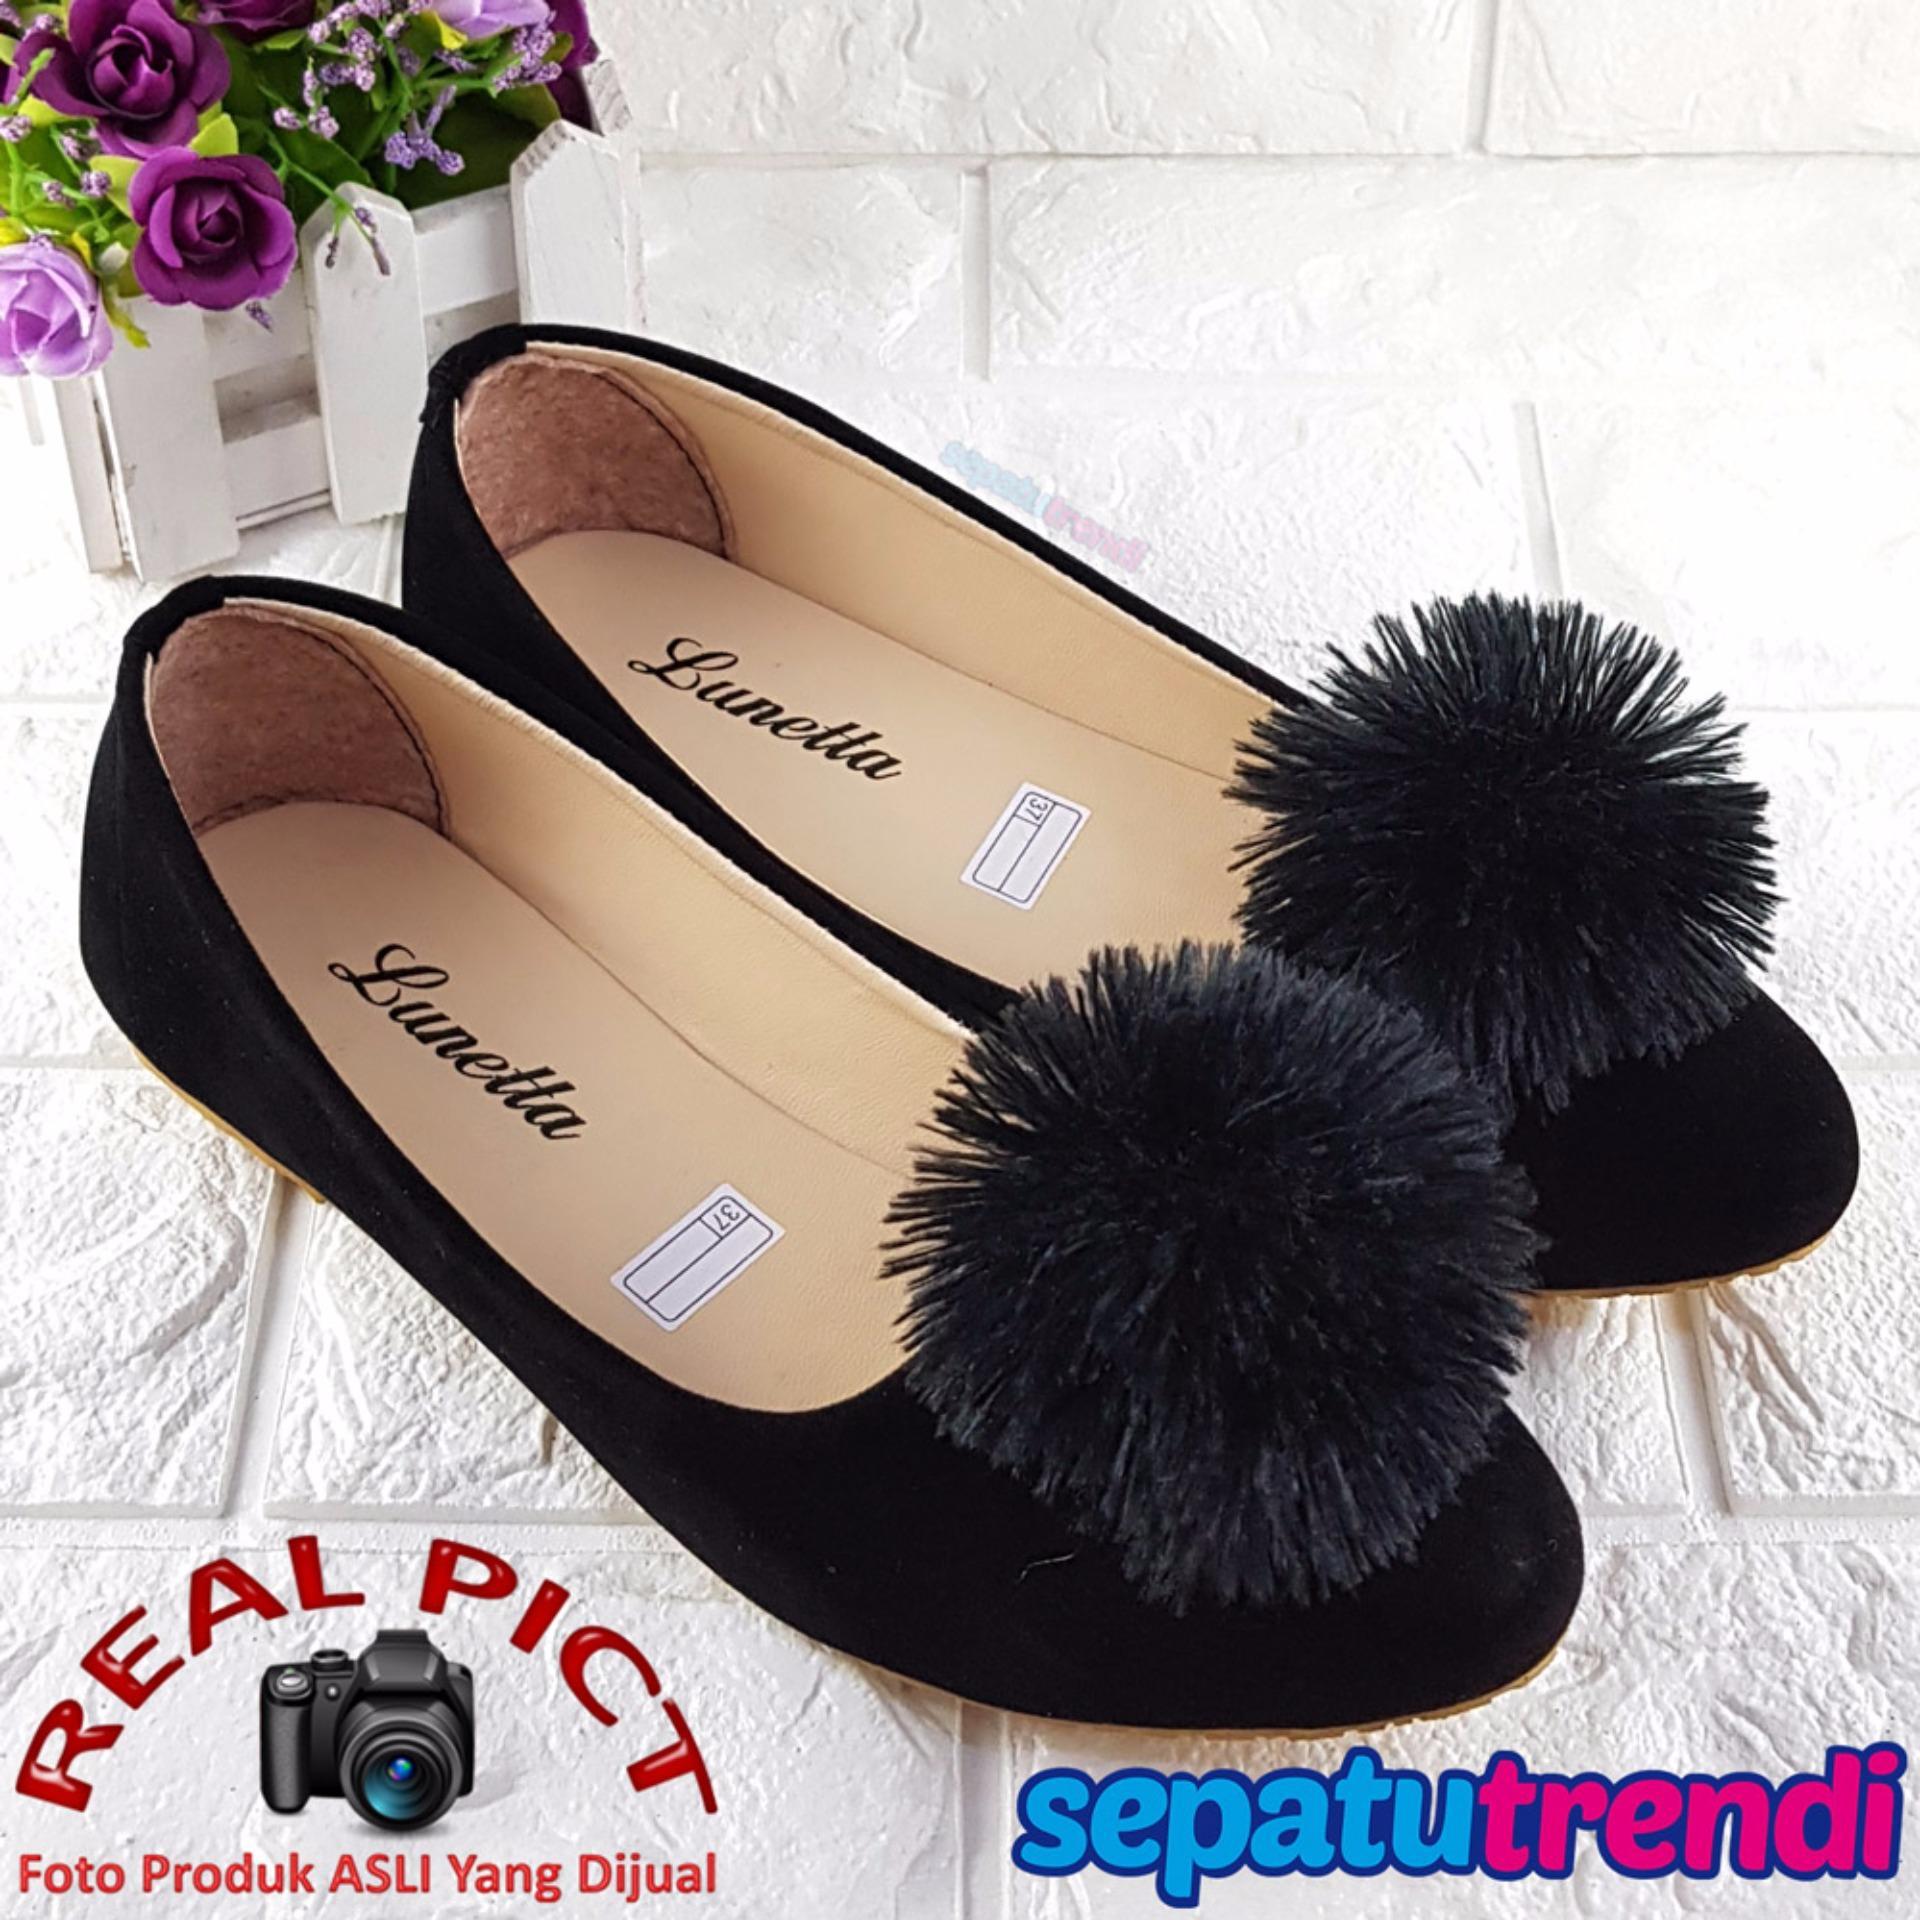 Nyaman dipakai Trendi Sepatu Wanita Flat Shoes Double Suede Pom POM